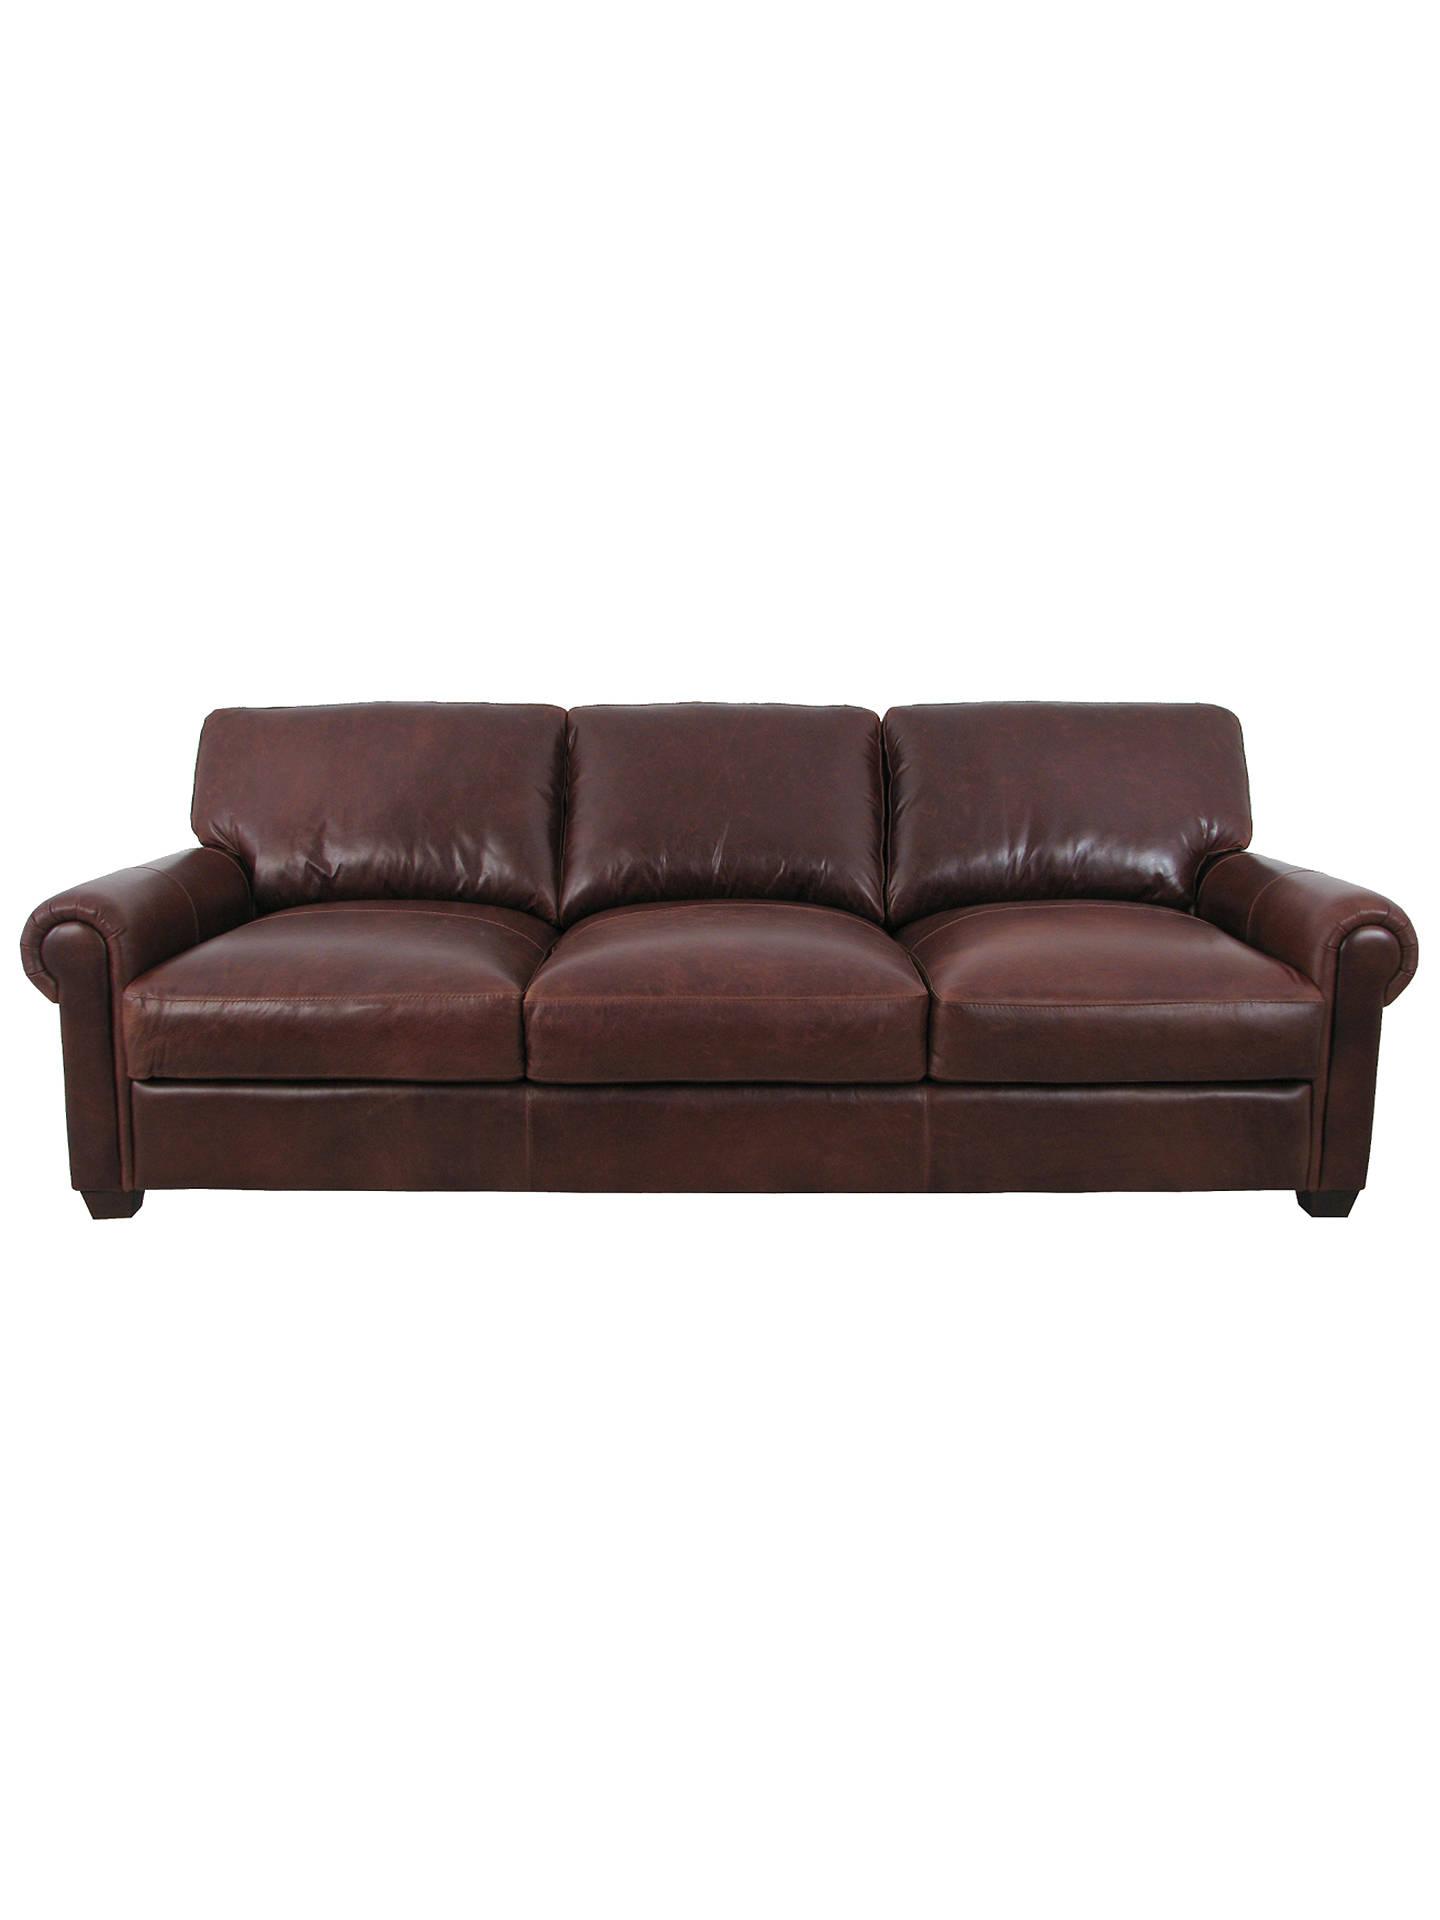 Strange John Lewis Modena Grand Leather Sofa Splendour Chestnut At Forskolin Free Trial Chair Design Images Forskolin Free Trialorg